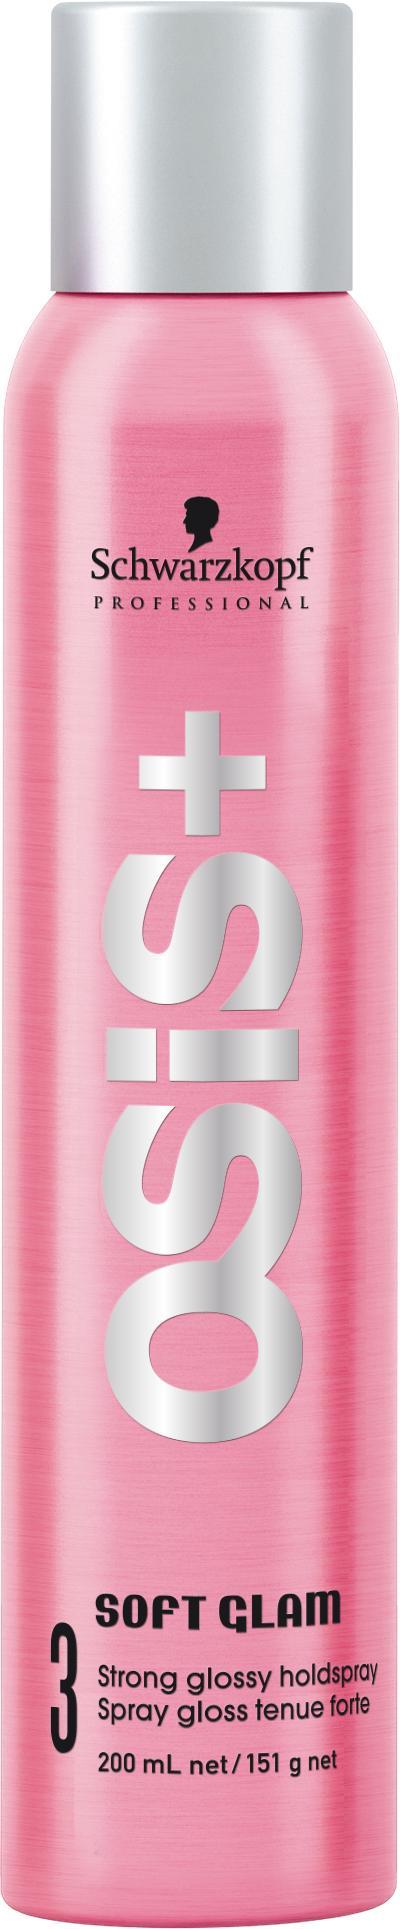 Schwarzkopf Osis+ Soft Glam - Strong Hairspray